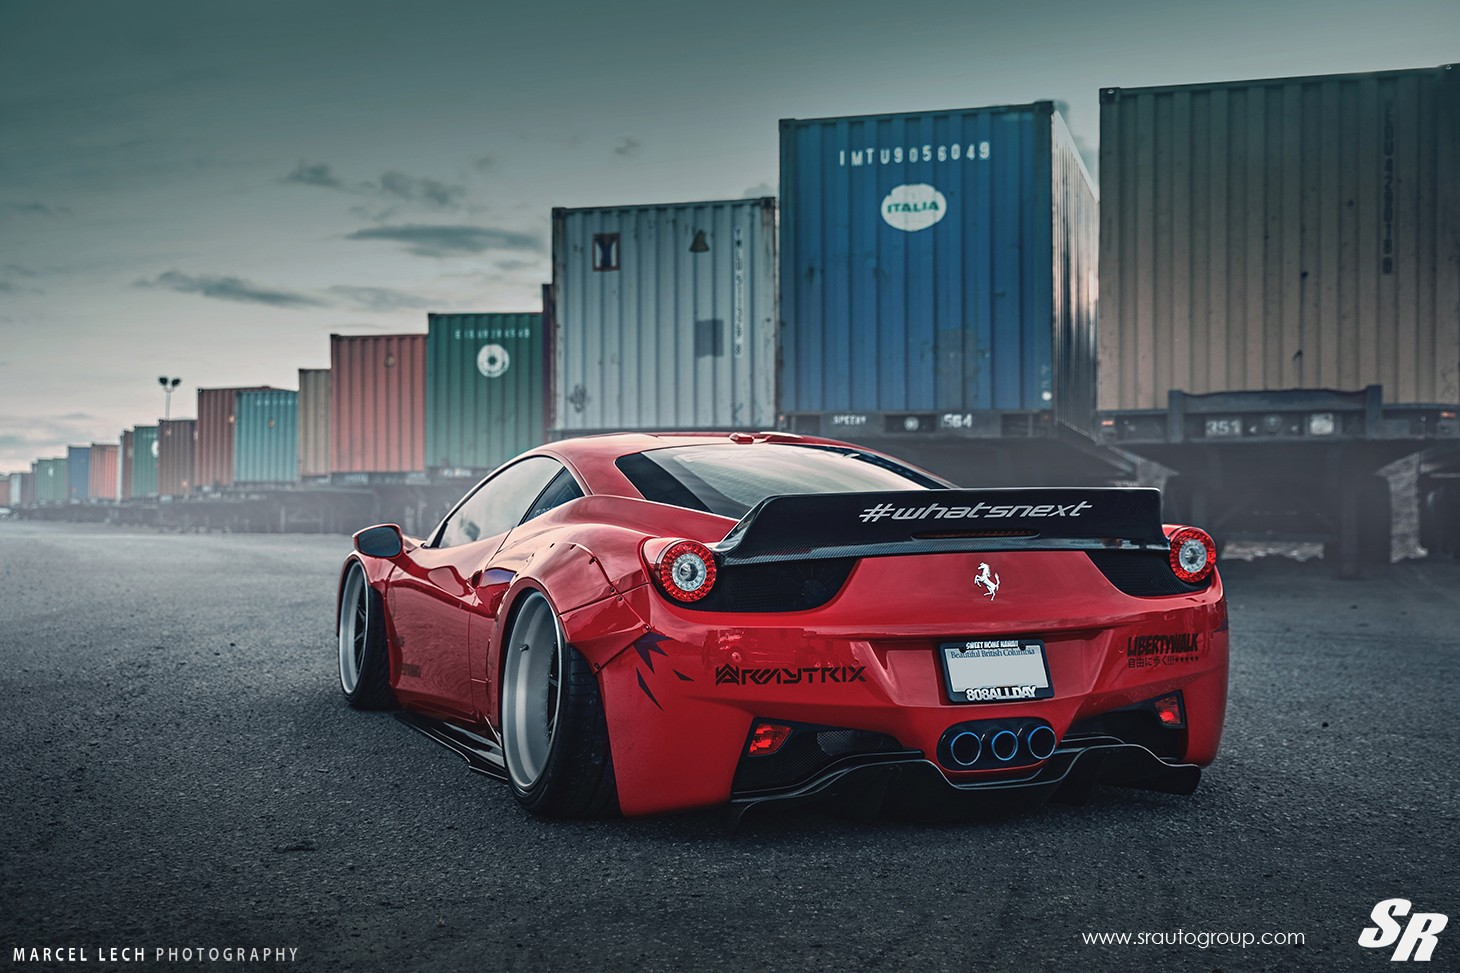 Desktop Machine Cars Lamborghini Wallpapers Liberty Walk Ferrari 458 Italia On Pur Wheels Italian